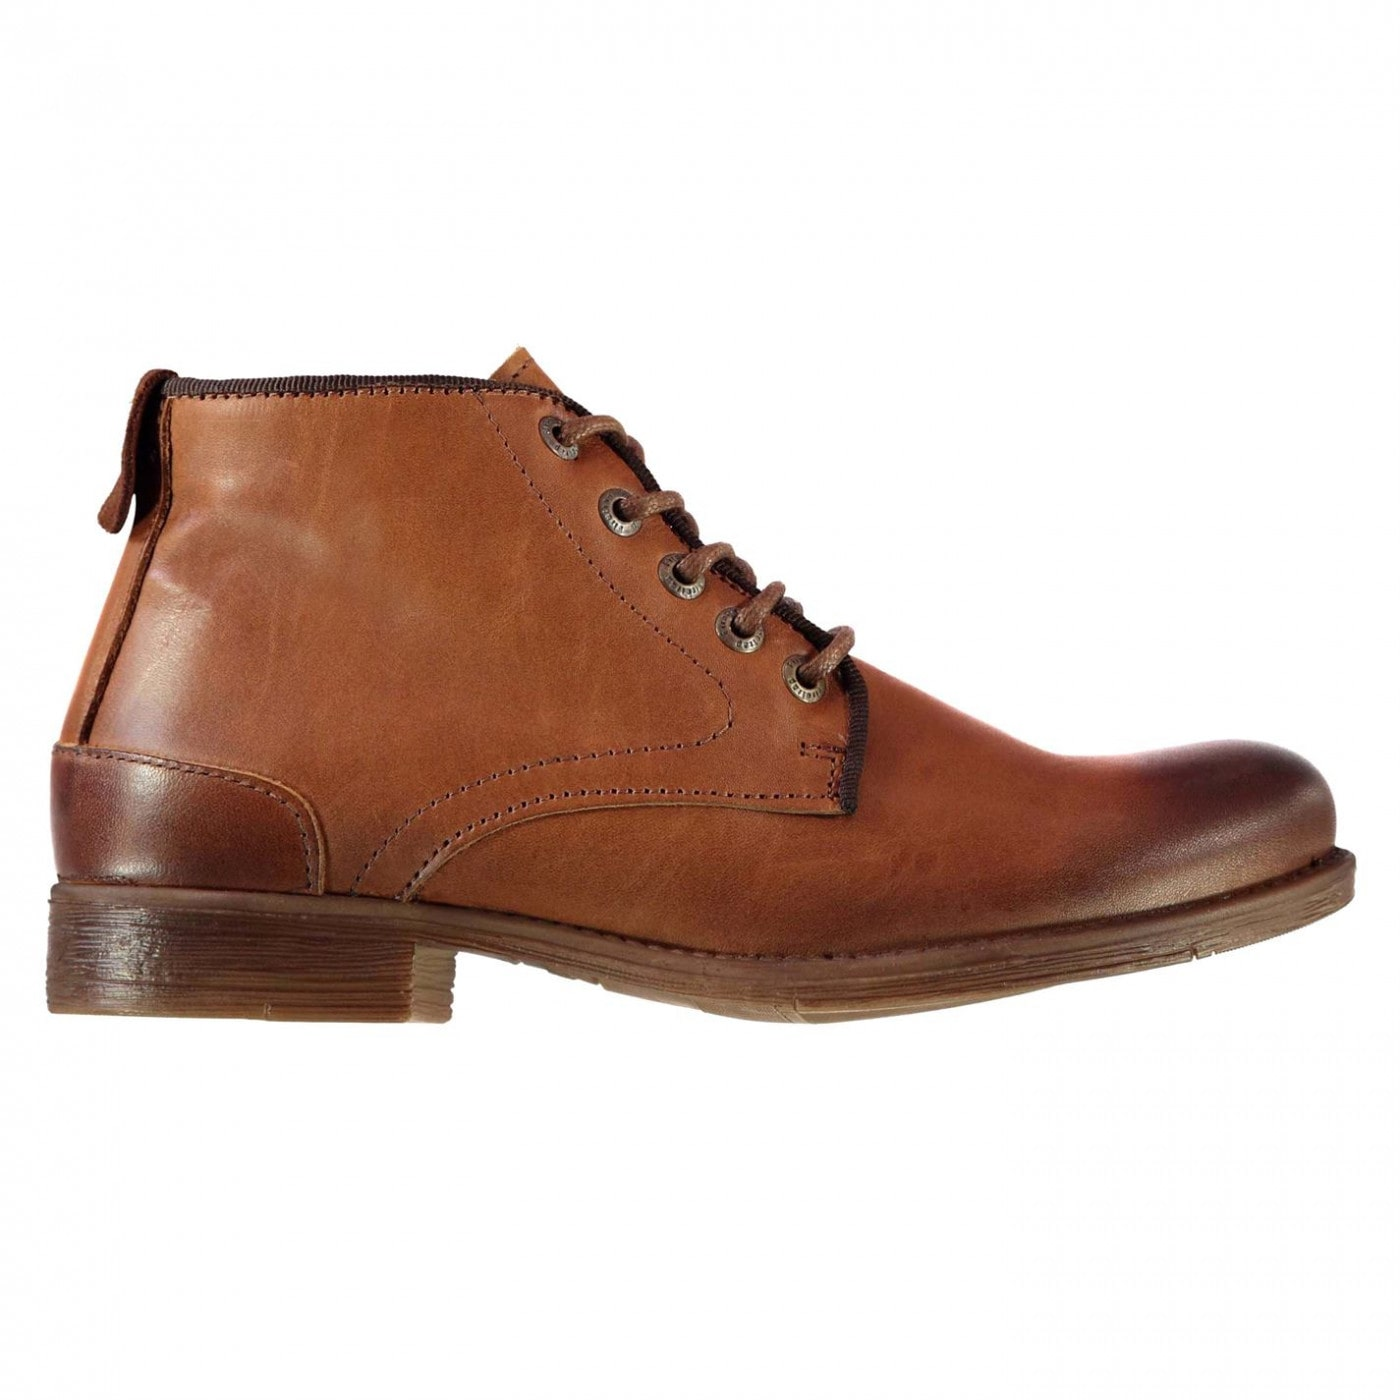 Firetrap Casca Junior Boots